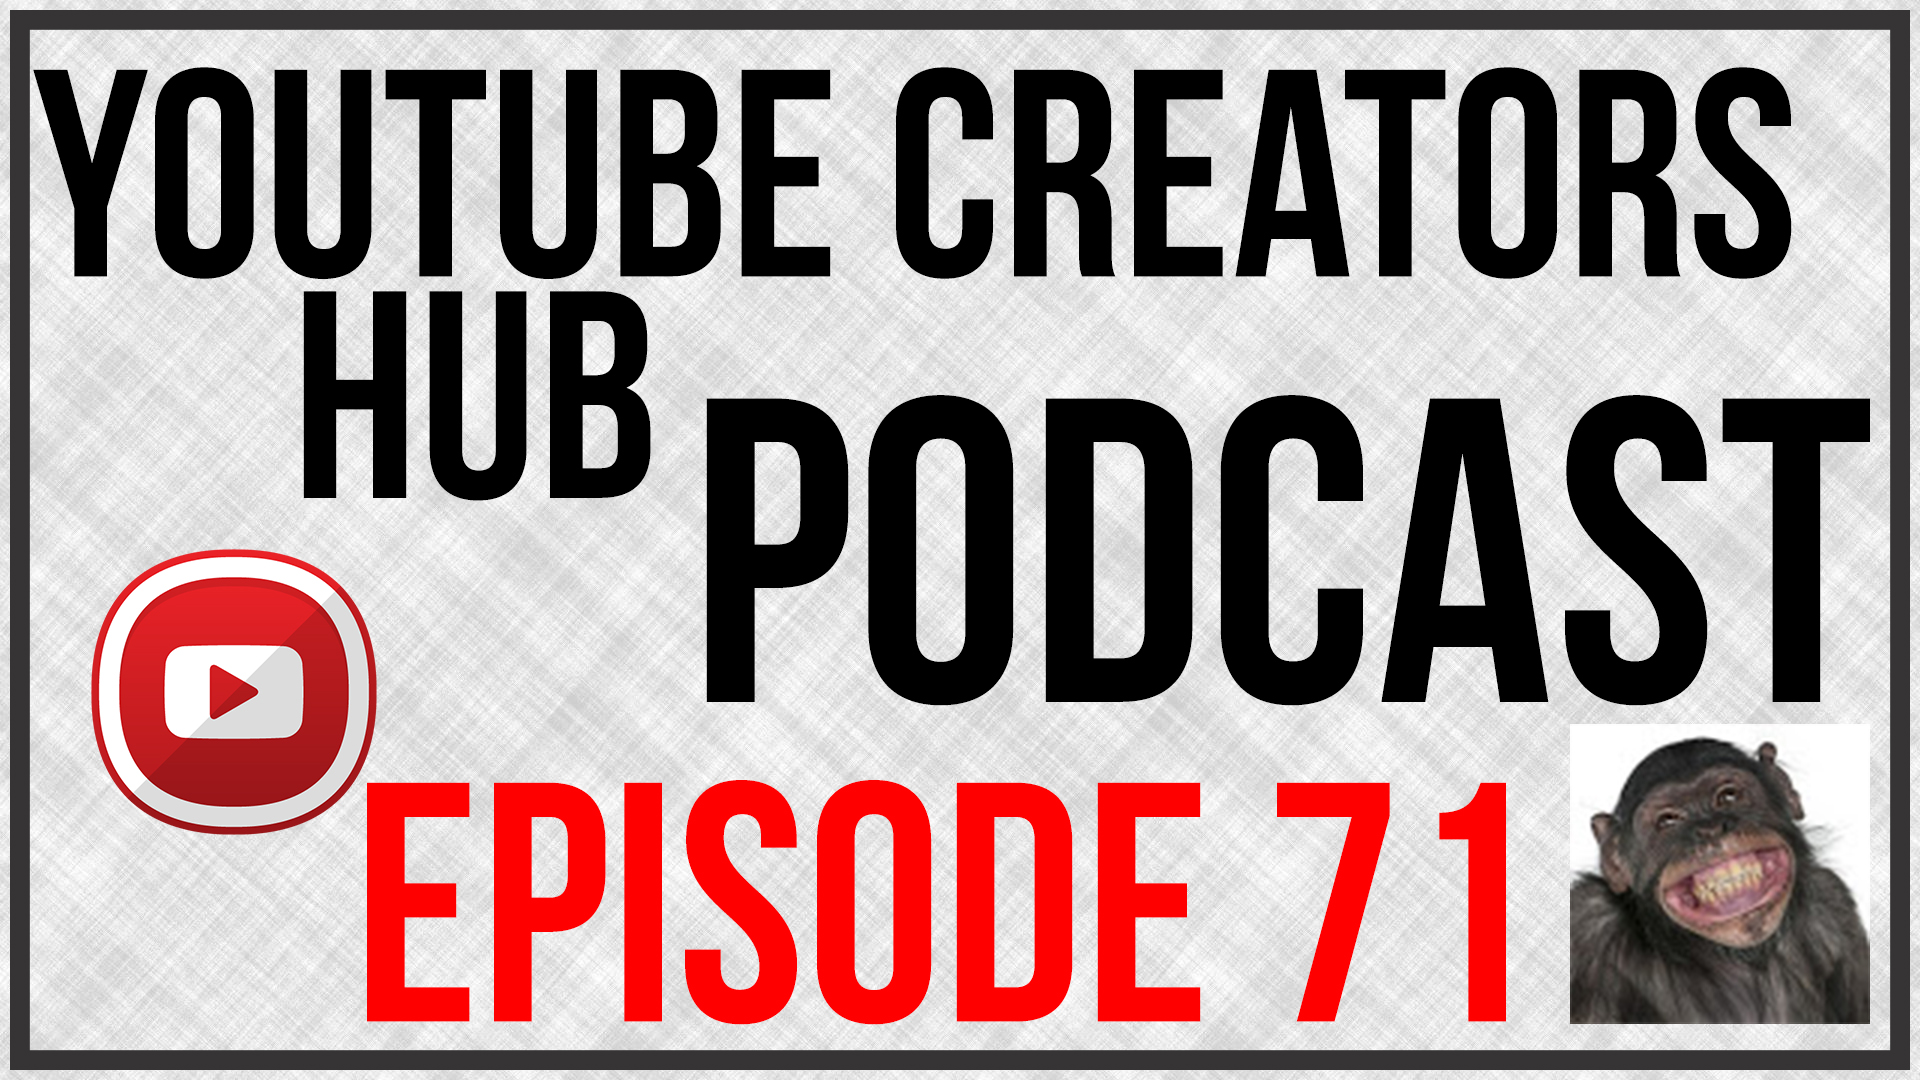 YouTube Creators Hub Podcast Episode 71